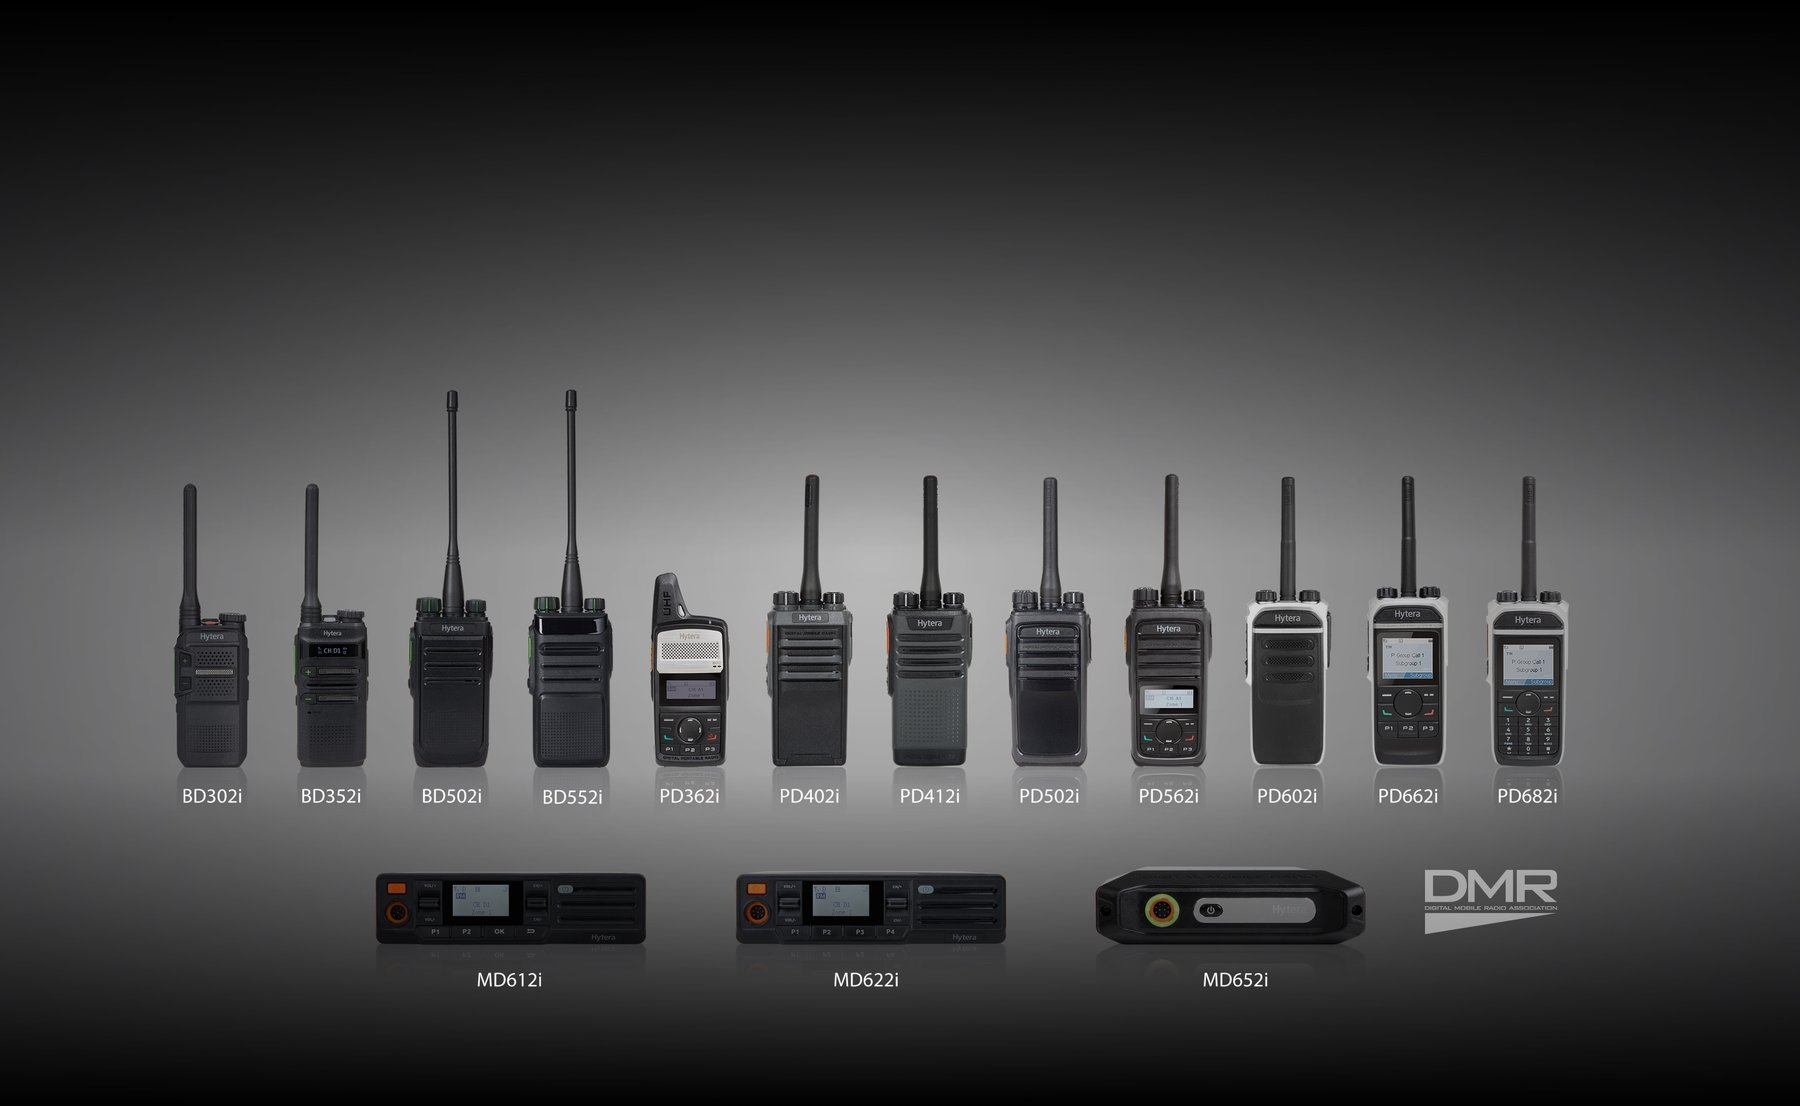 Advanced DMR 2-way radio systems